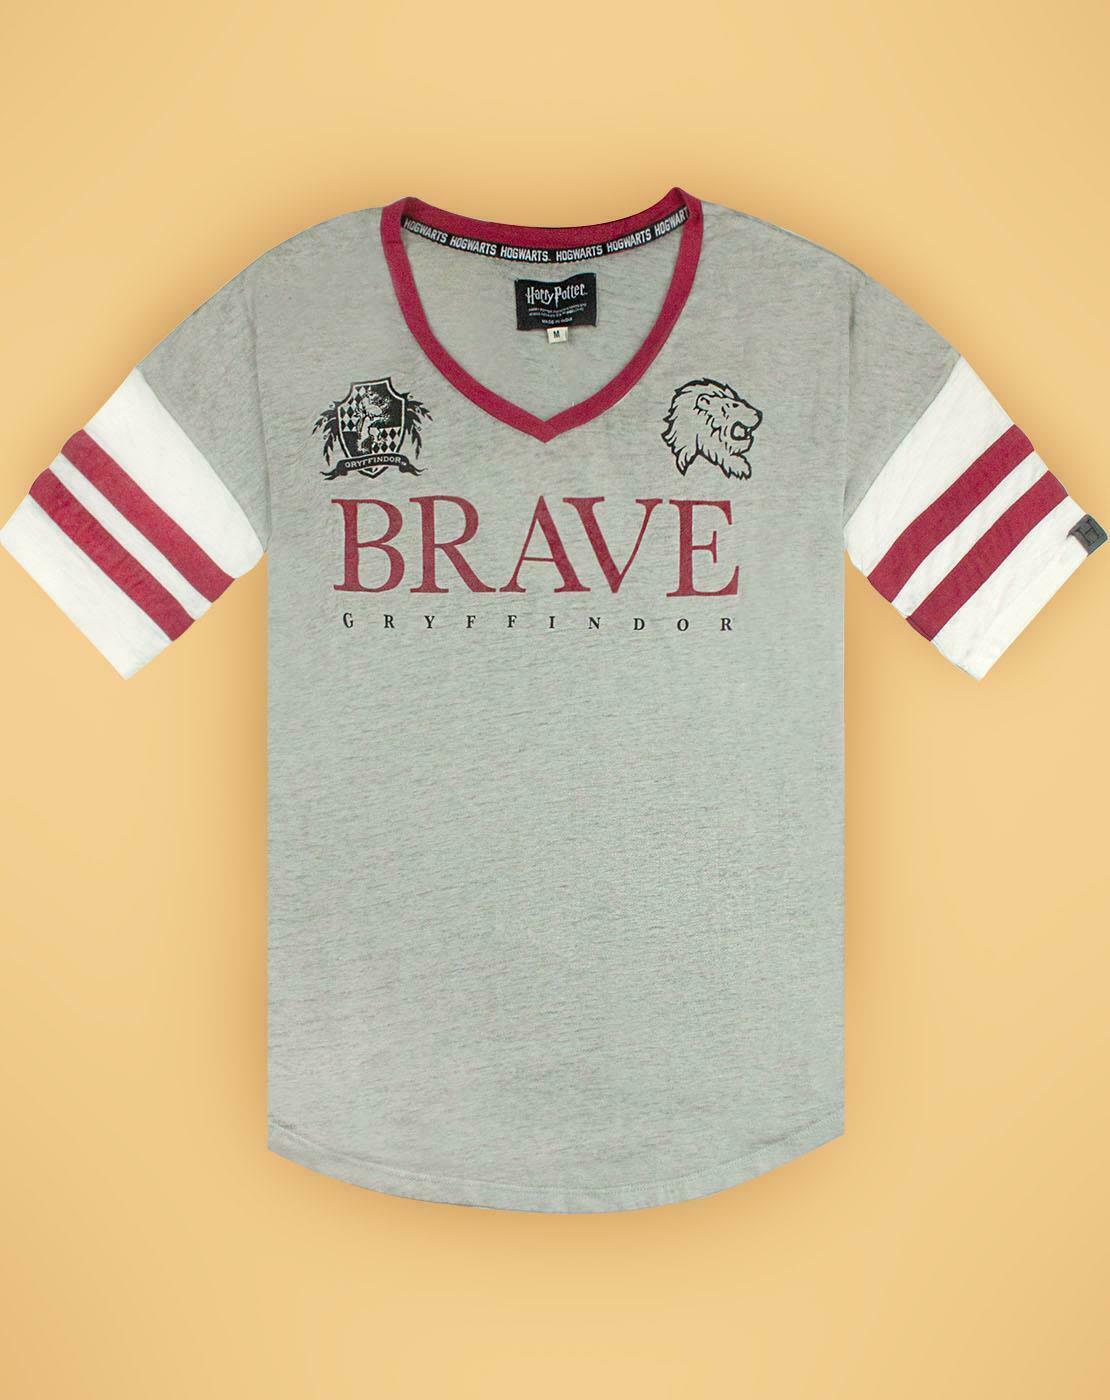 Harry-Potter-Gryffindor-valiente-mujer-dama-Varsity-Camiseta-Tallas-S-XL miniatura 15